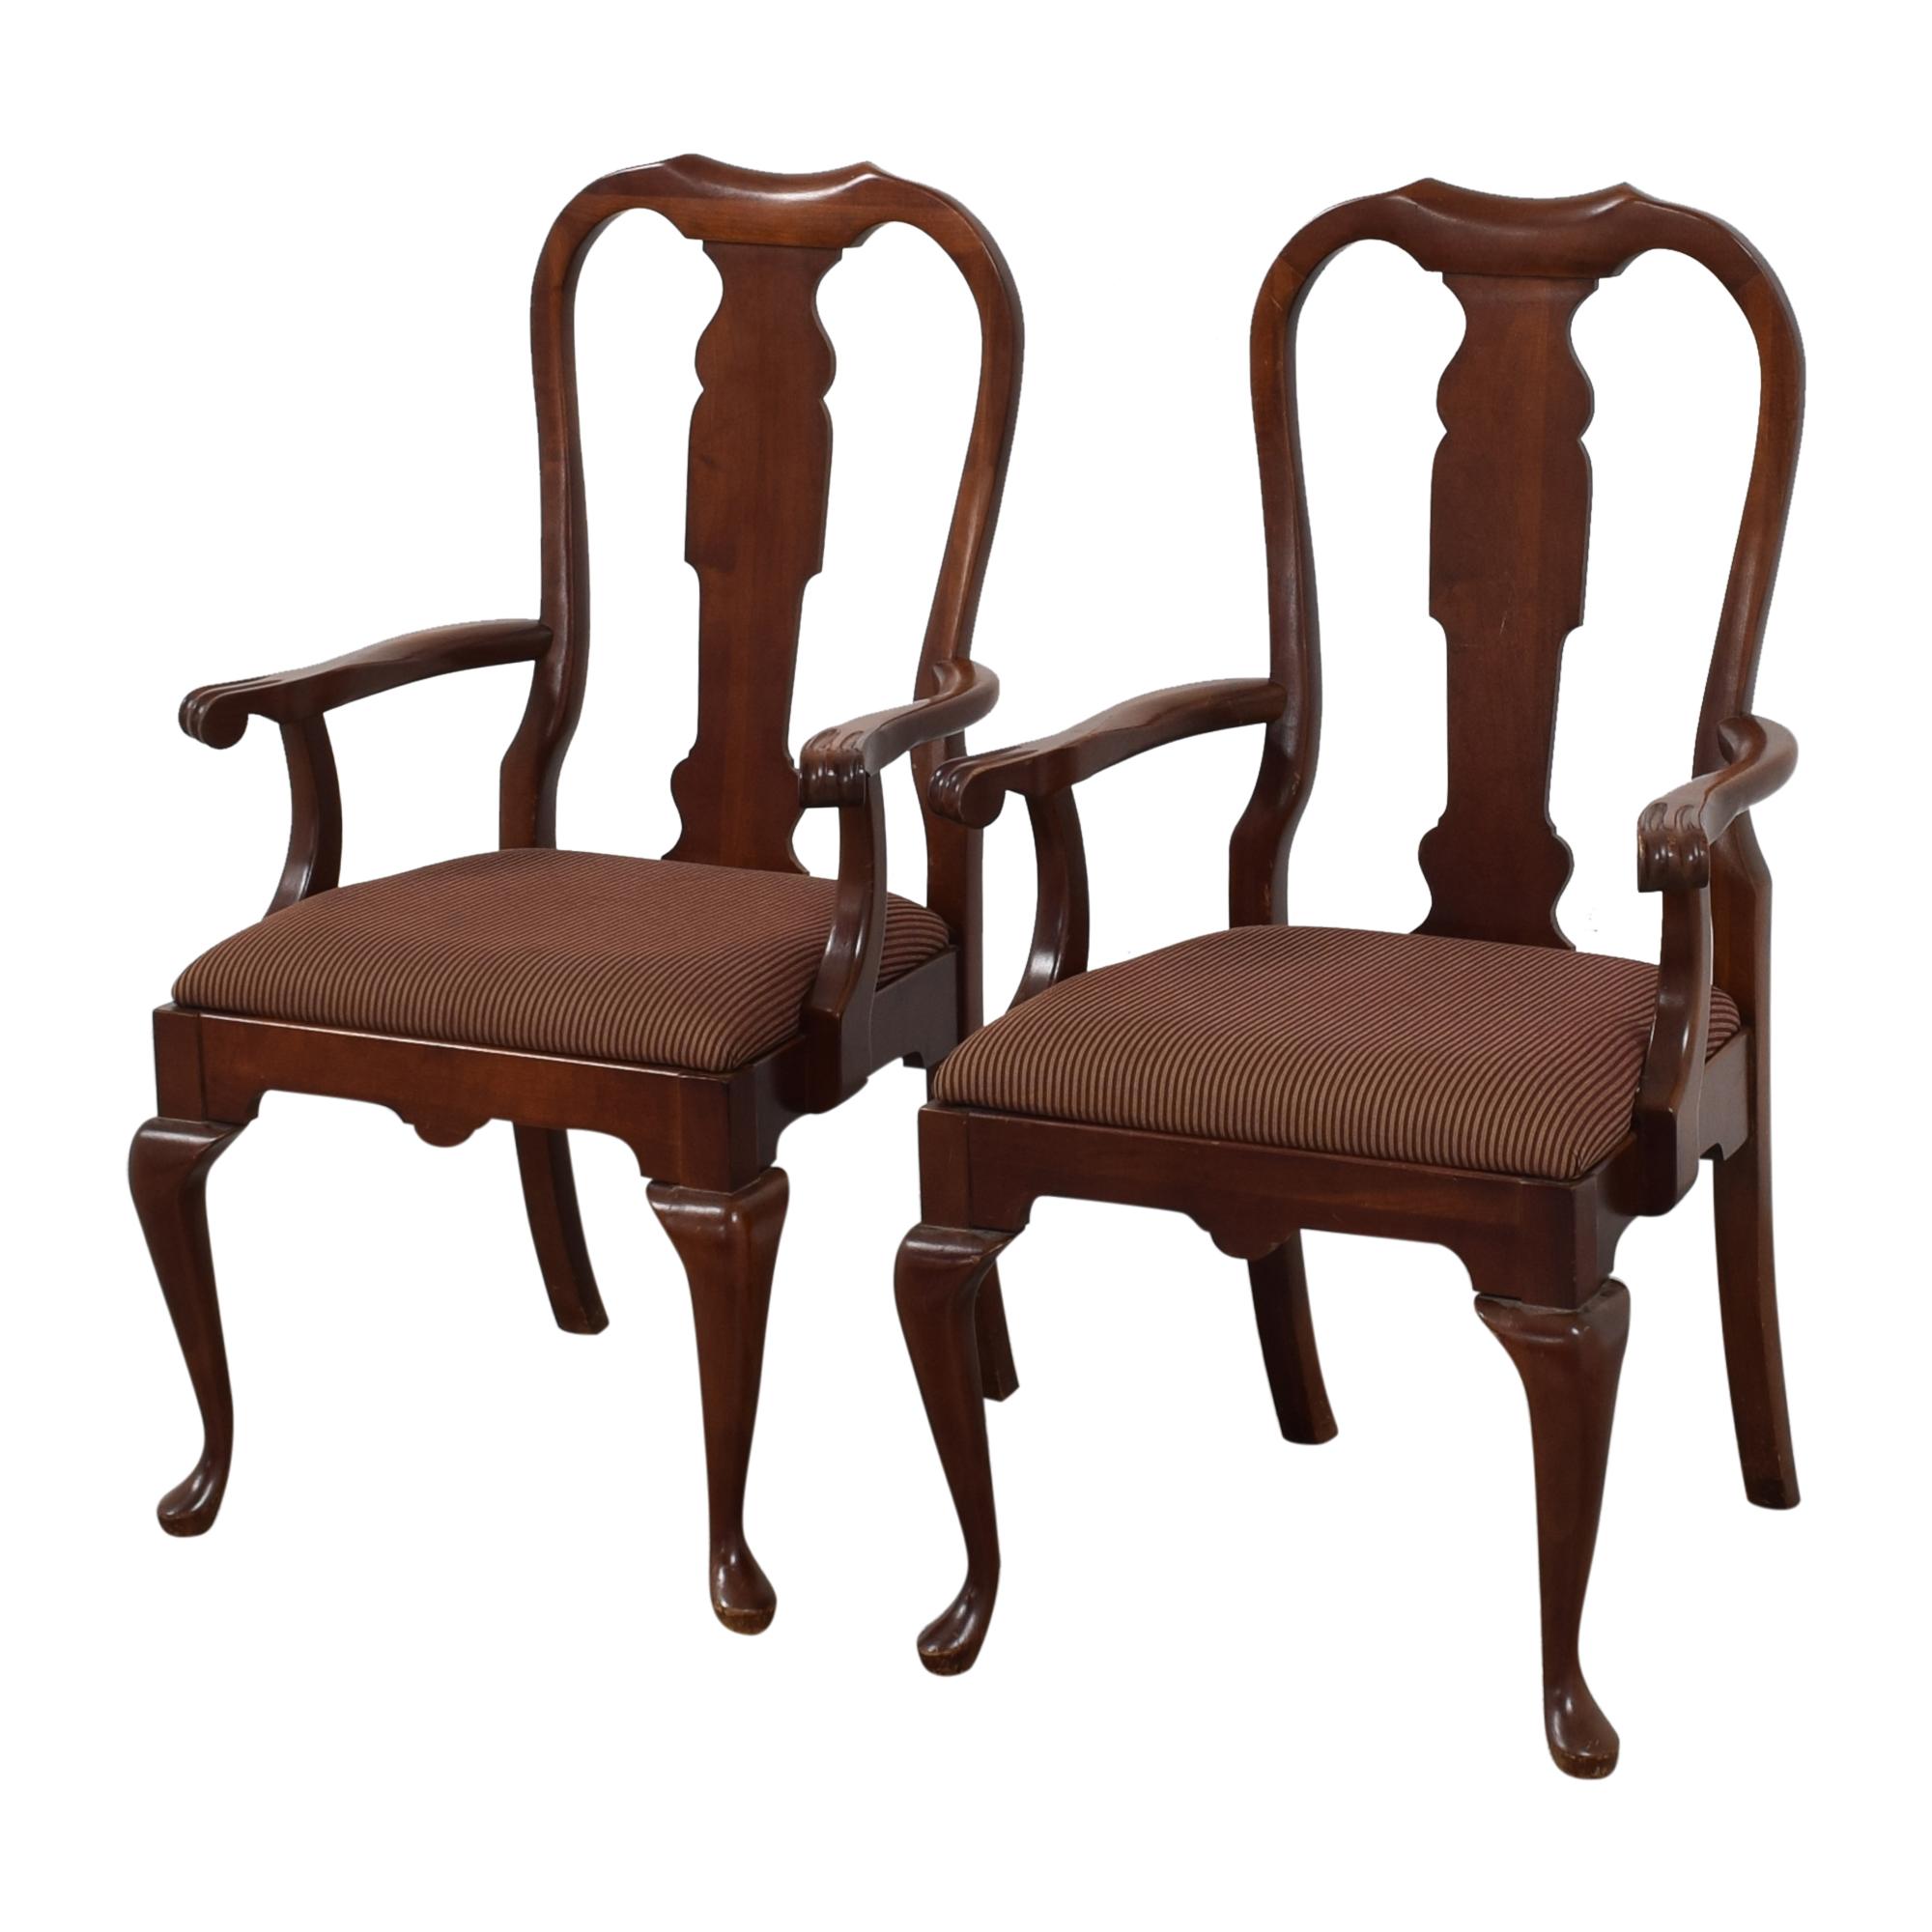 Pennsylvania House Pennsylvania House Queen Anne Dining Arm Chairs dimensions